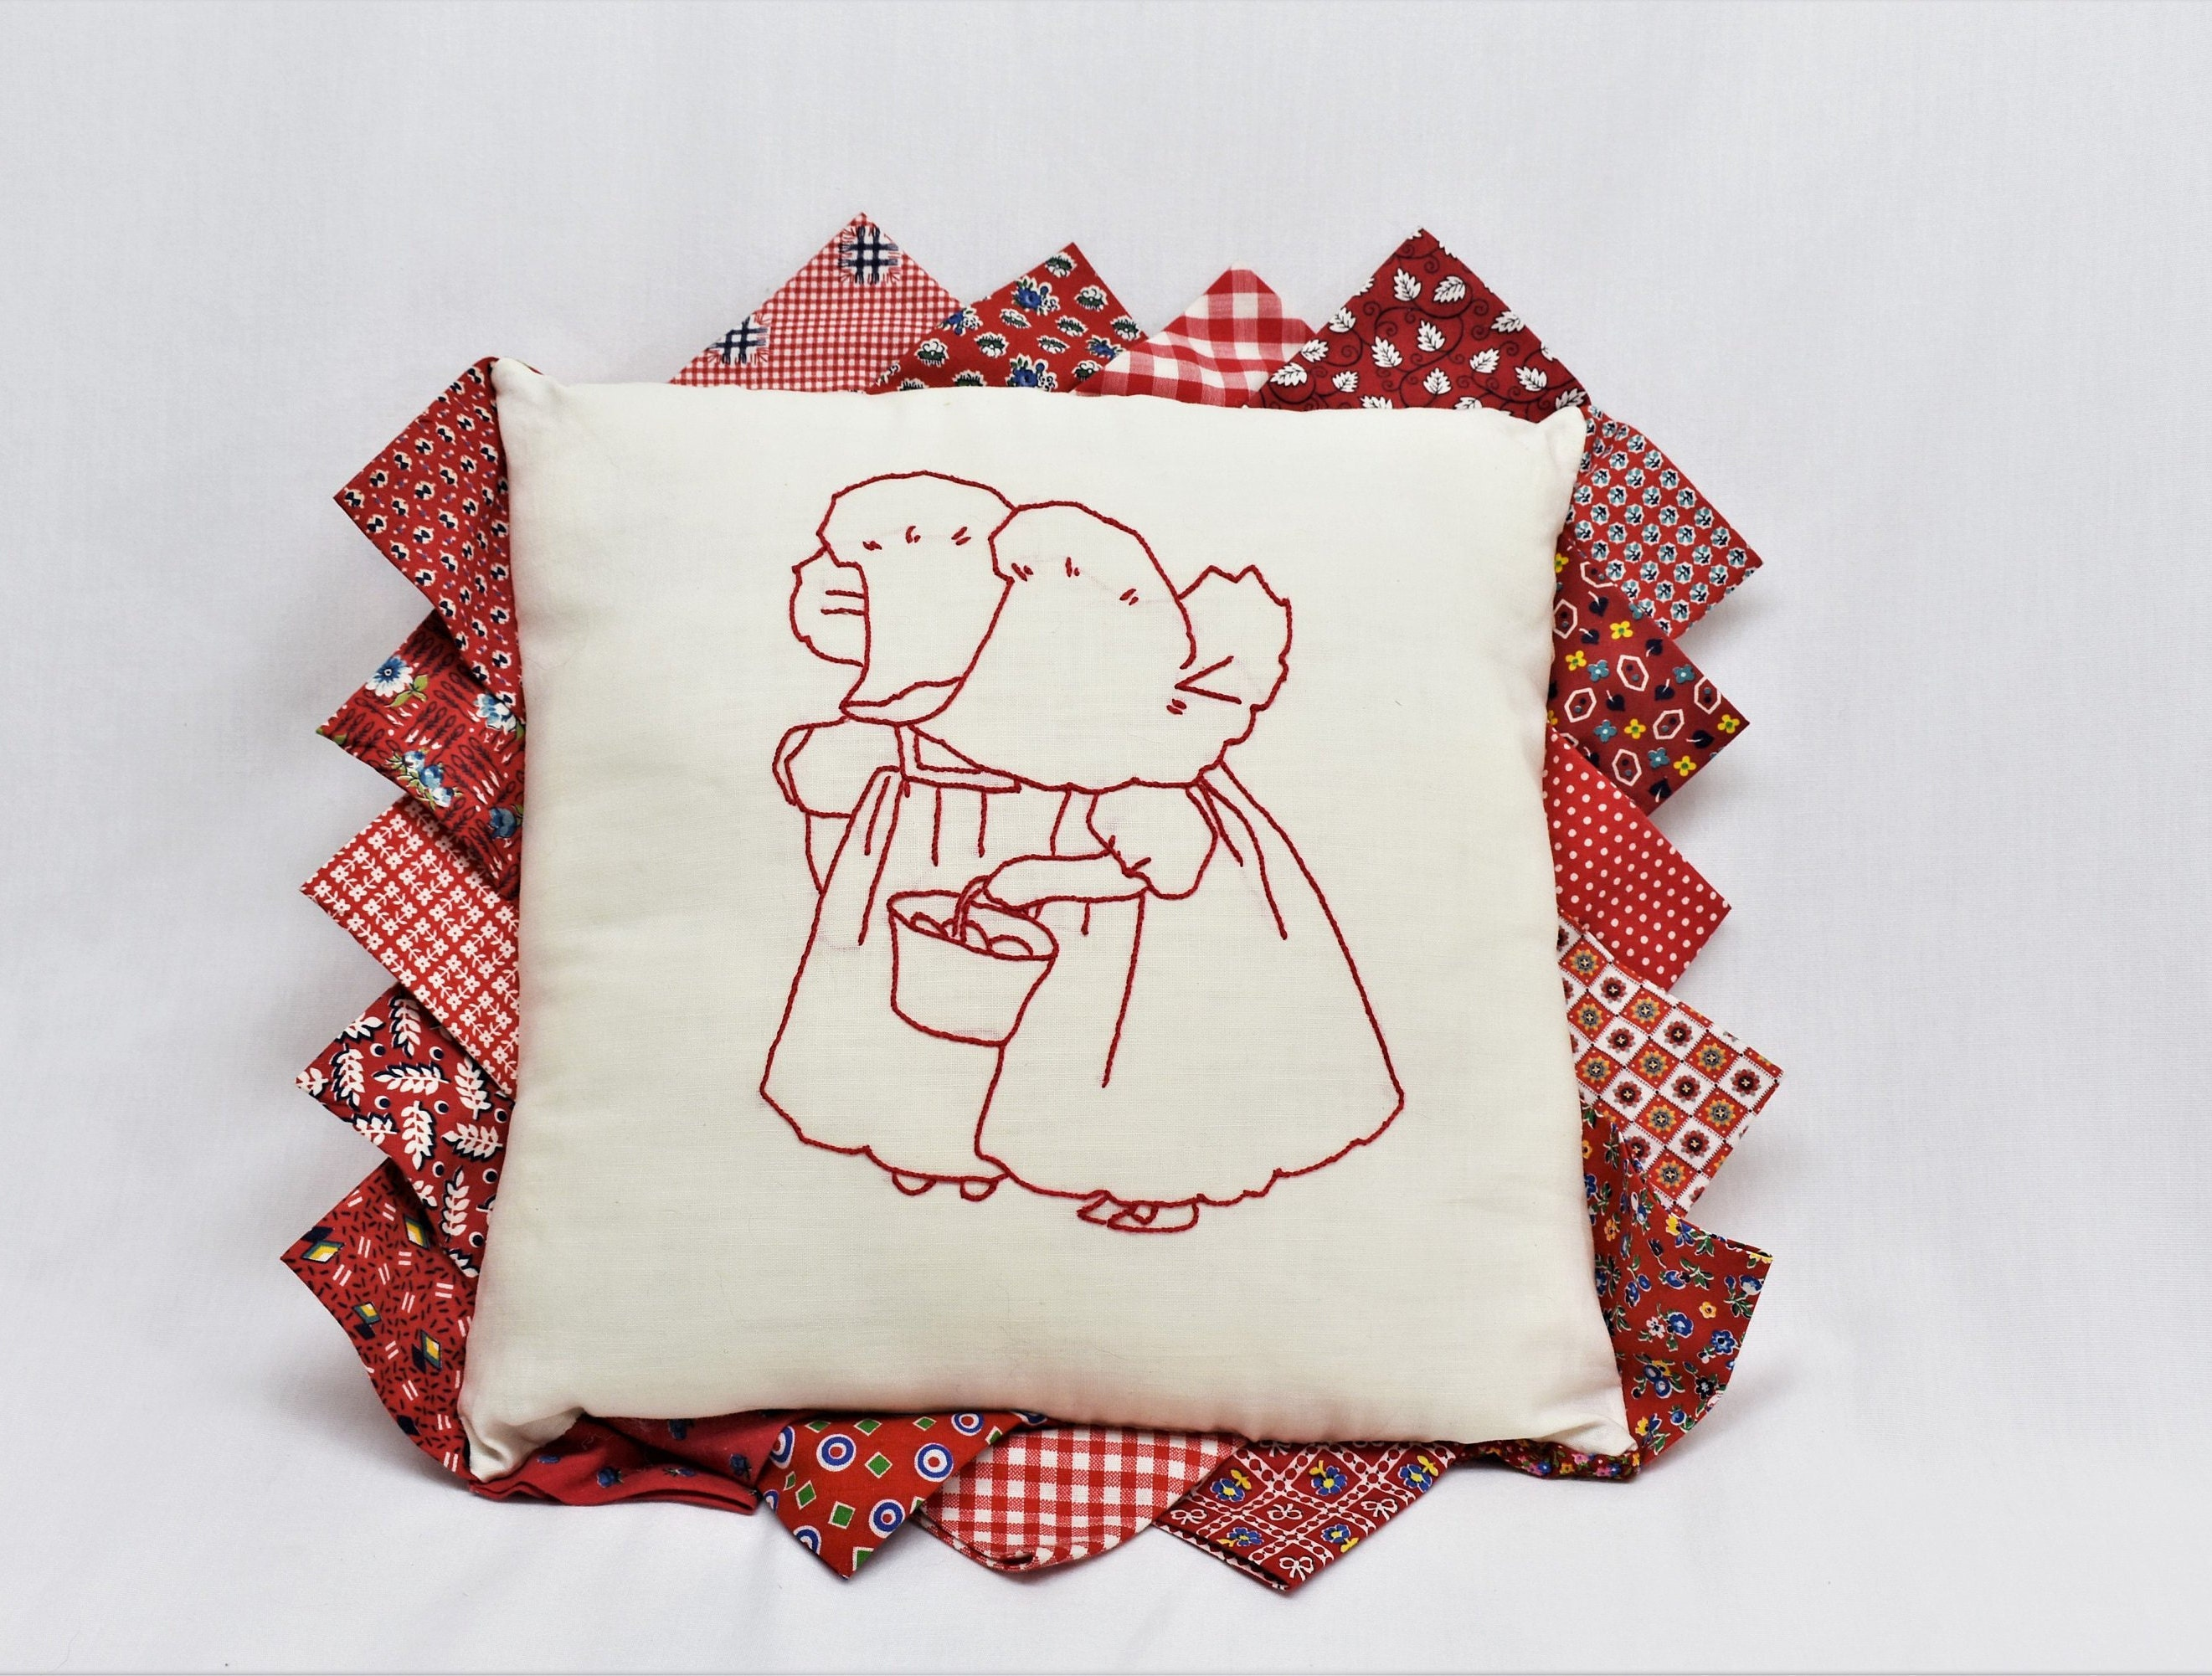 3d32f0640 Sunbonnet Sue Pillow, Sunbonnet Babies Handmade Throw Pillow, Baby's Room  Girl's Room Vintage Style Decorative Pillow, Red Patchwork Pillow